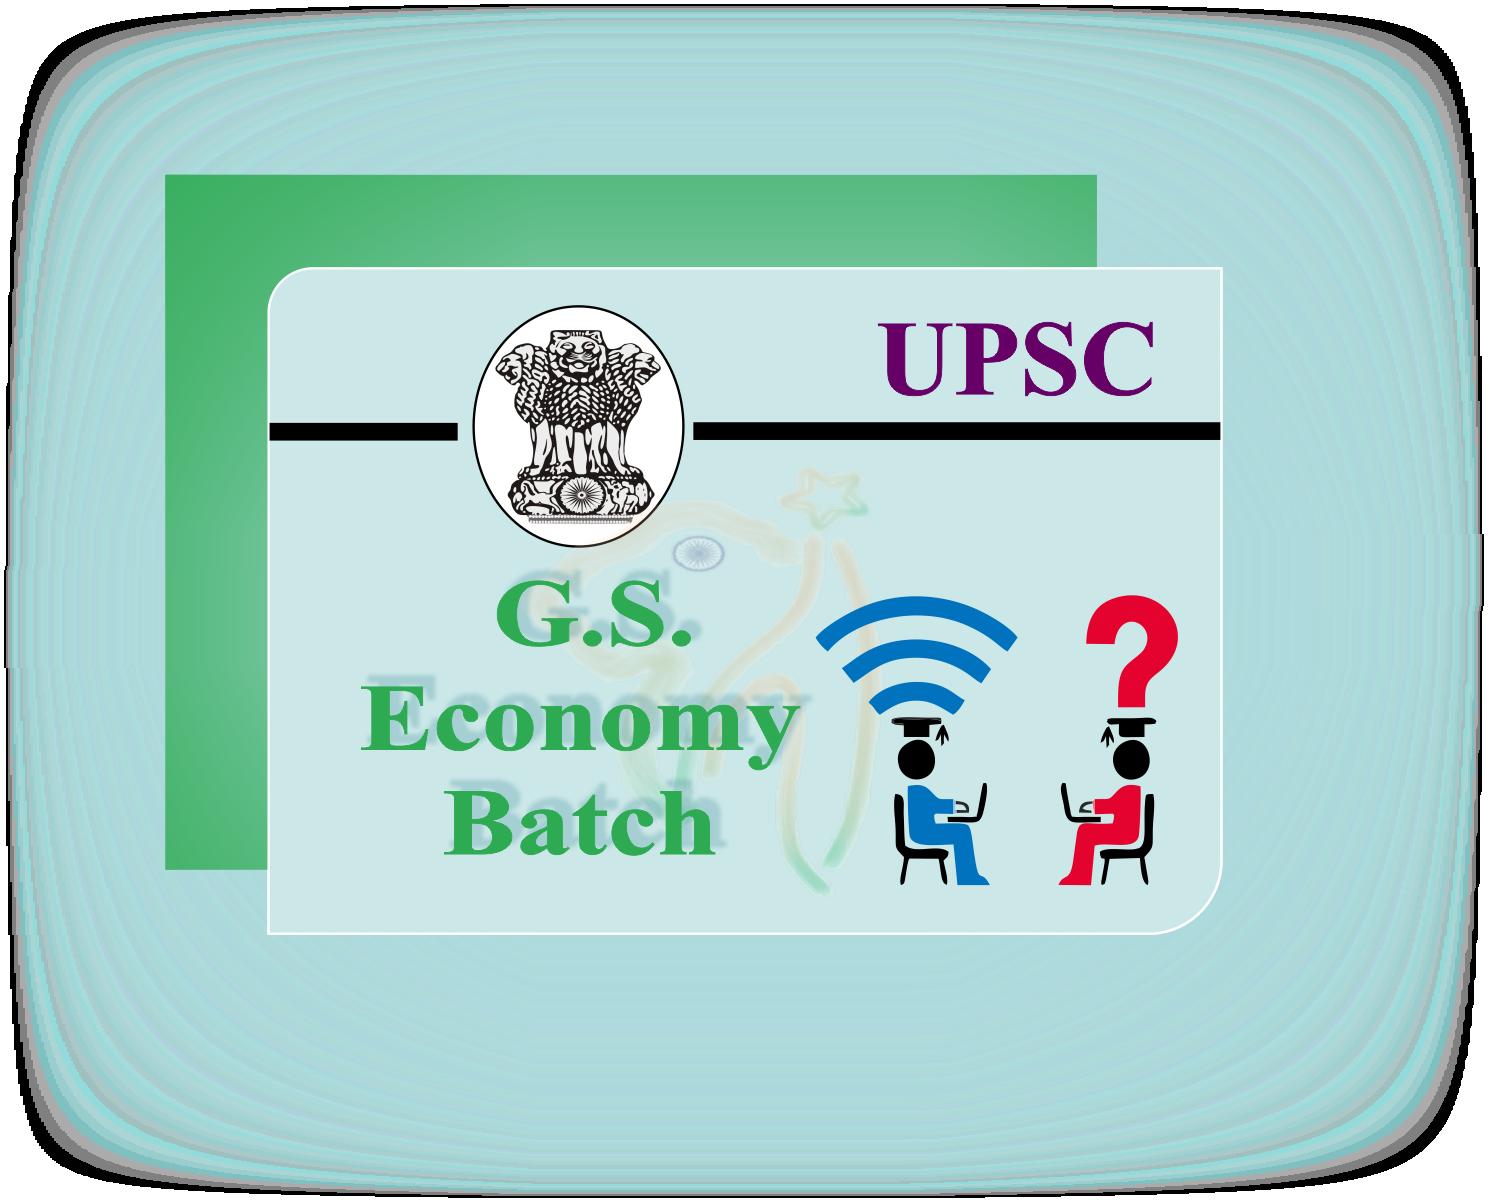 UPSC GS- Economy Batch